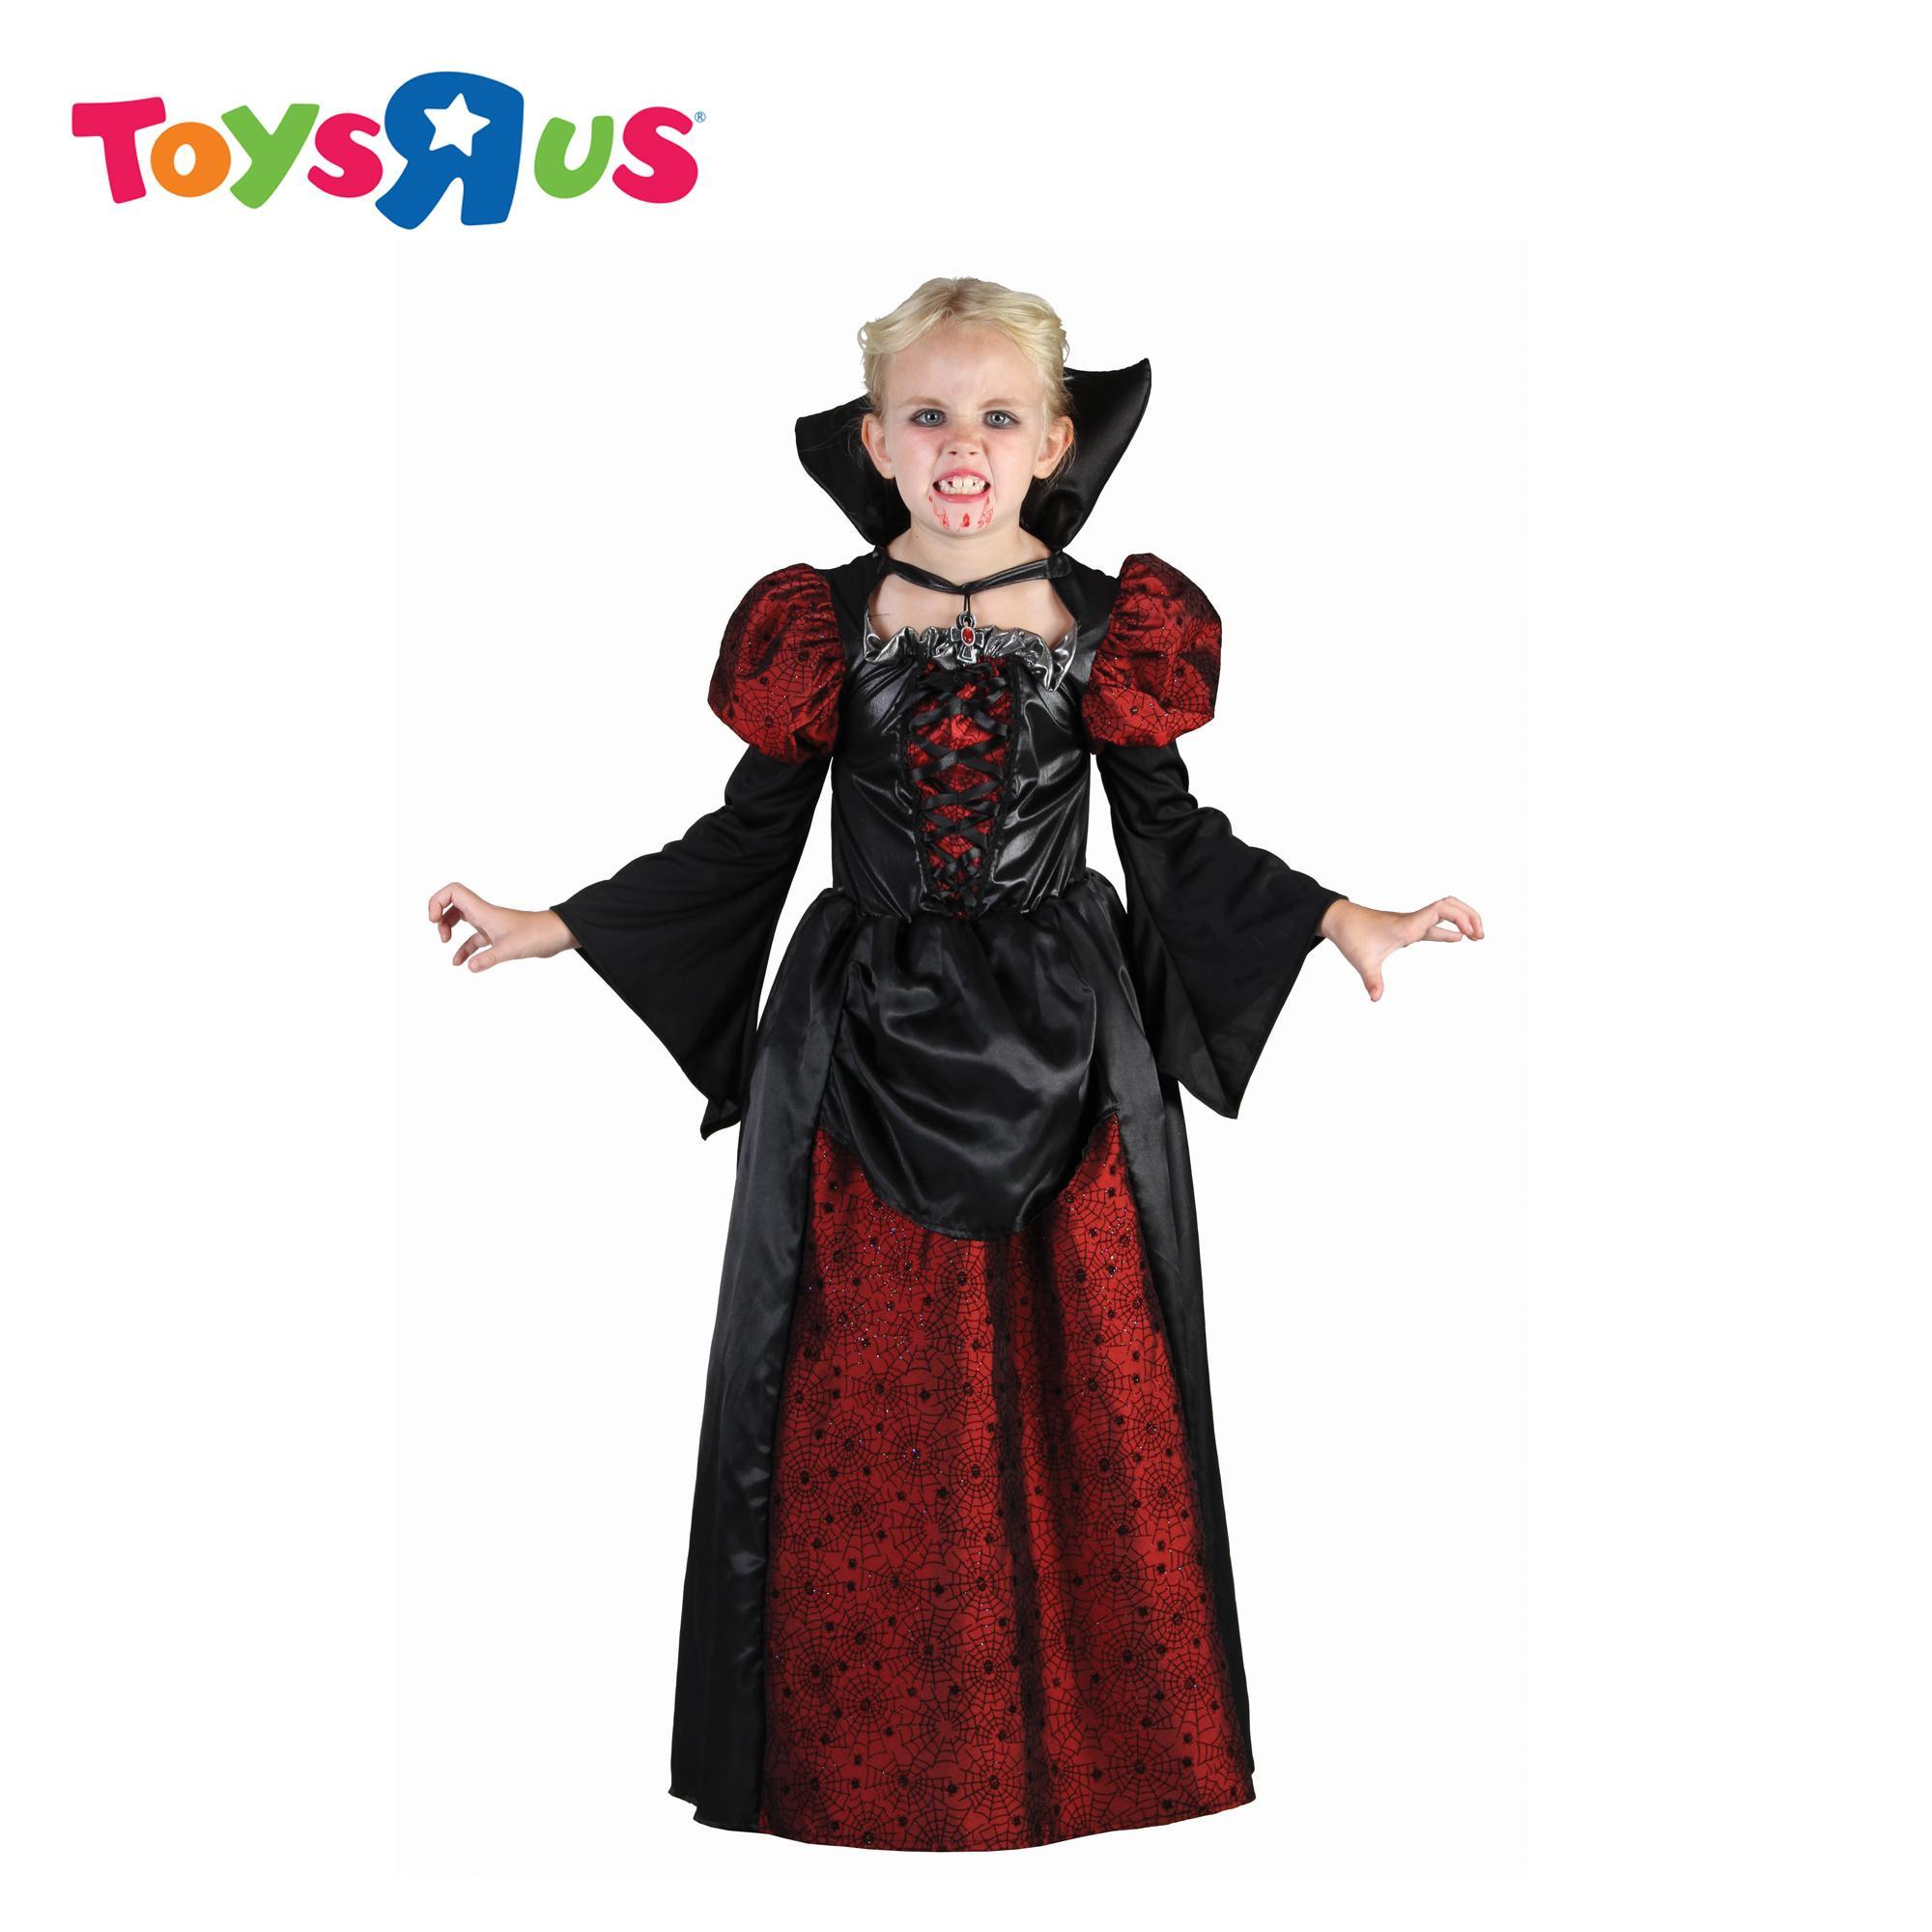 Mavis Halloween Costume Toddler.Deluxe Vampiress Large